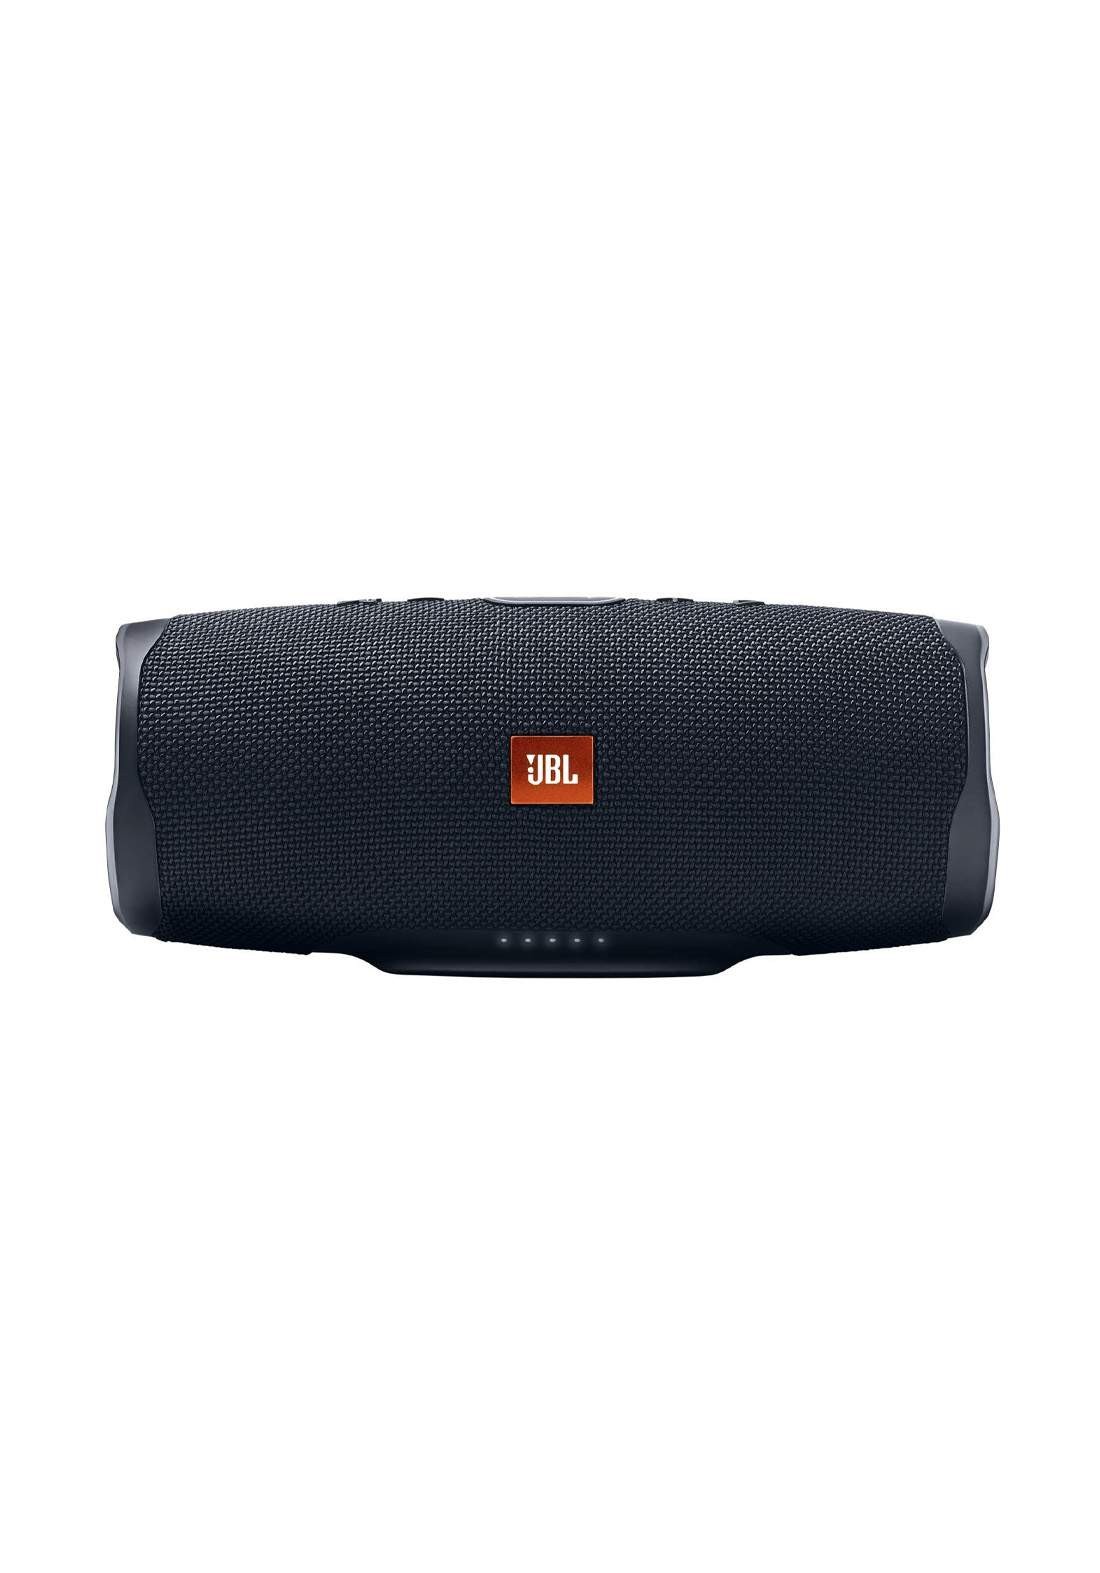 JBL Charge 4 Portable Waterproof Wireless Bluetooth Speaker - Black مكبر صوت